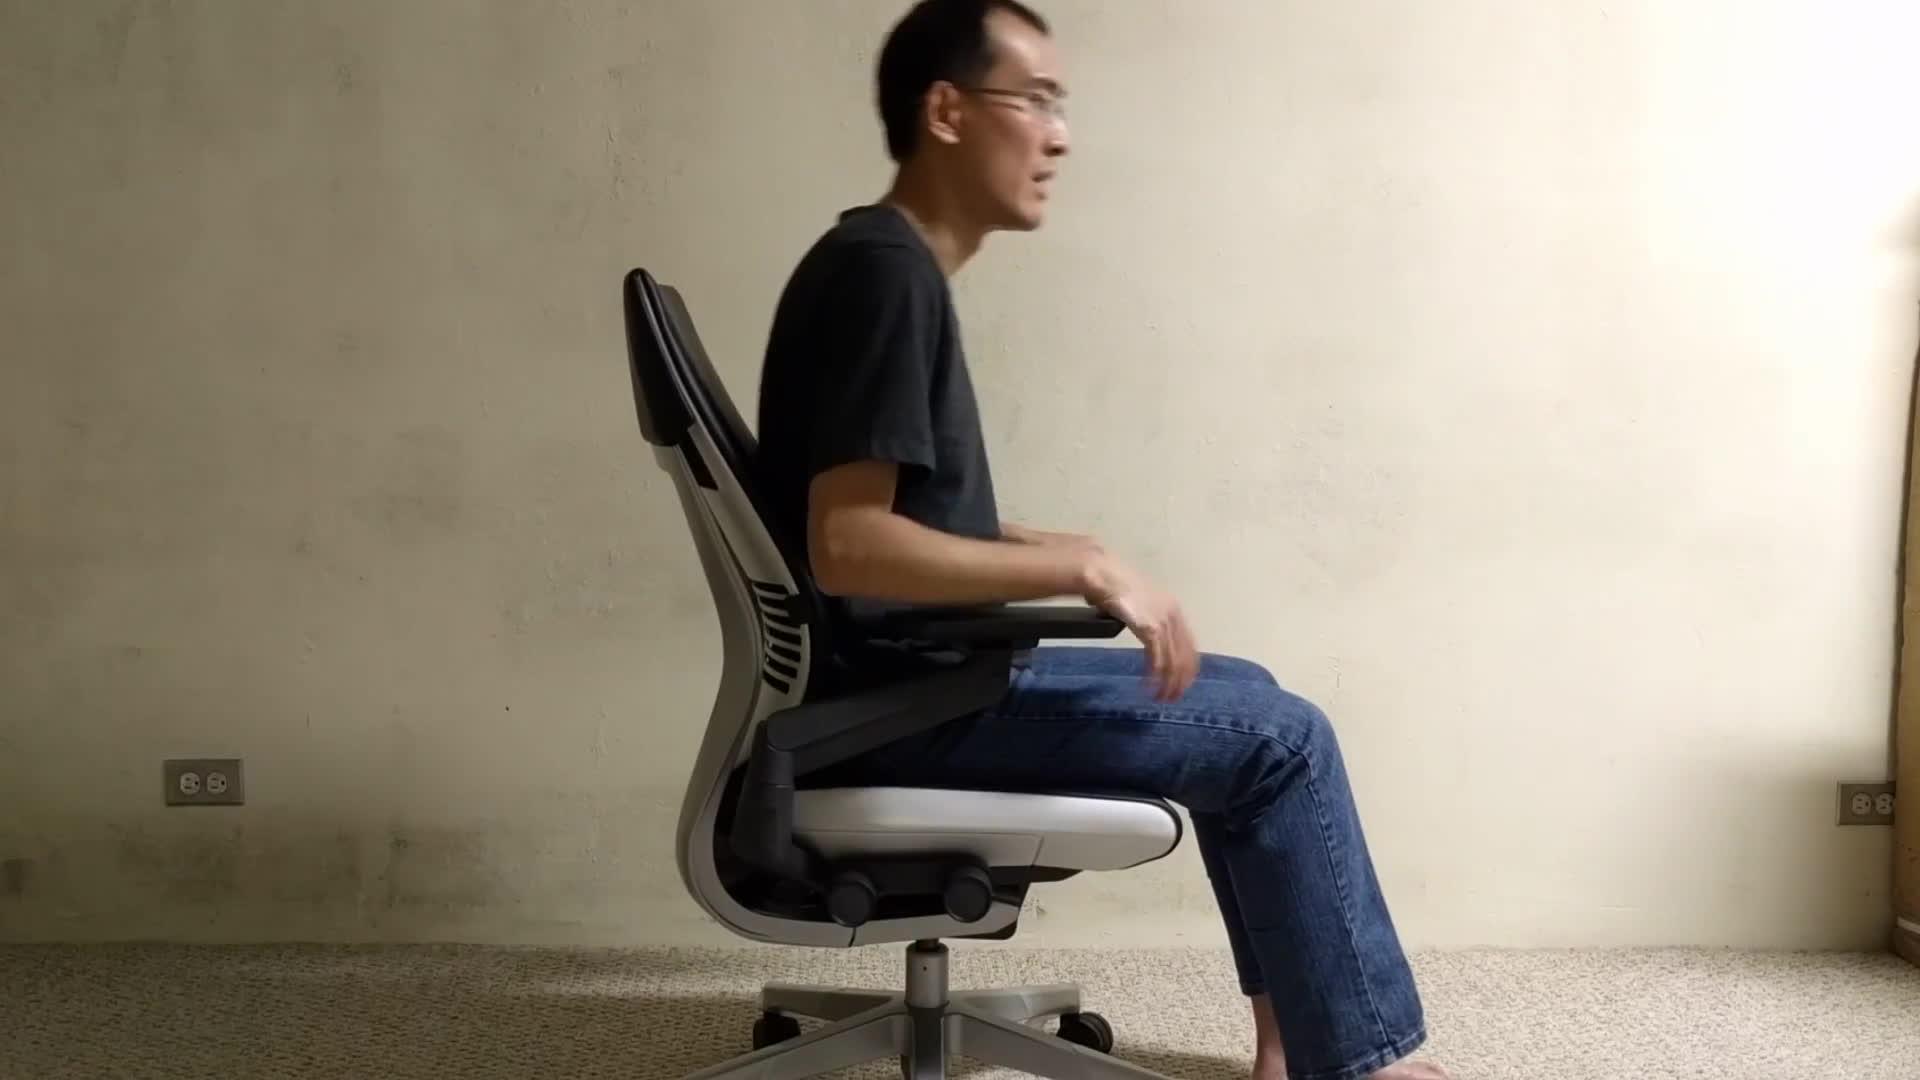 Steelcase Gesture Chair   Flexible Back   Find, Make U0026 Share Gfycat GIFs